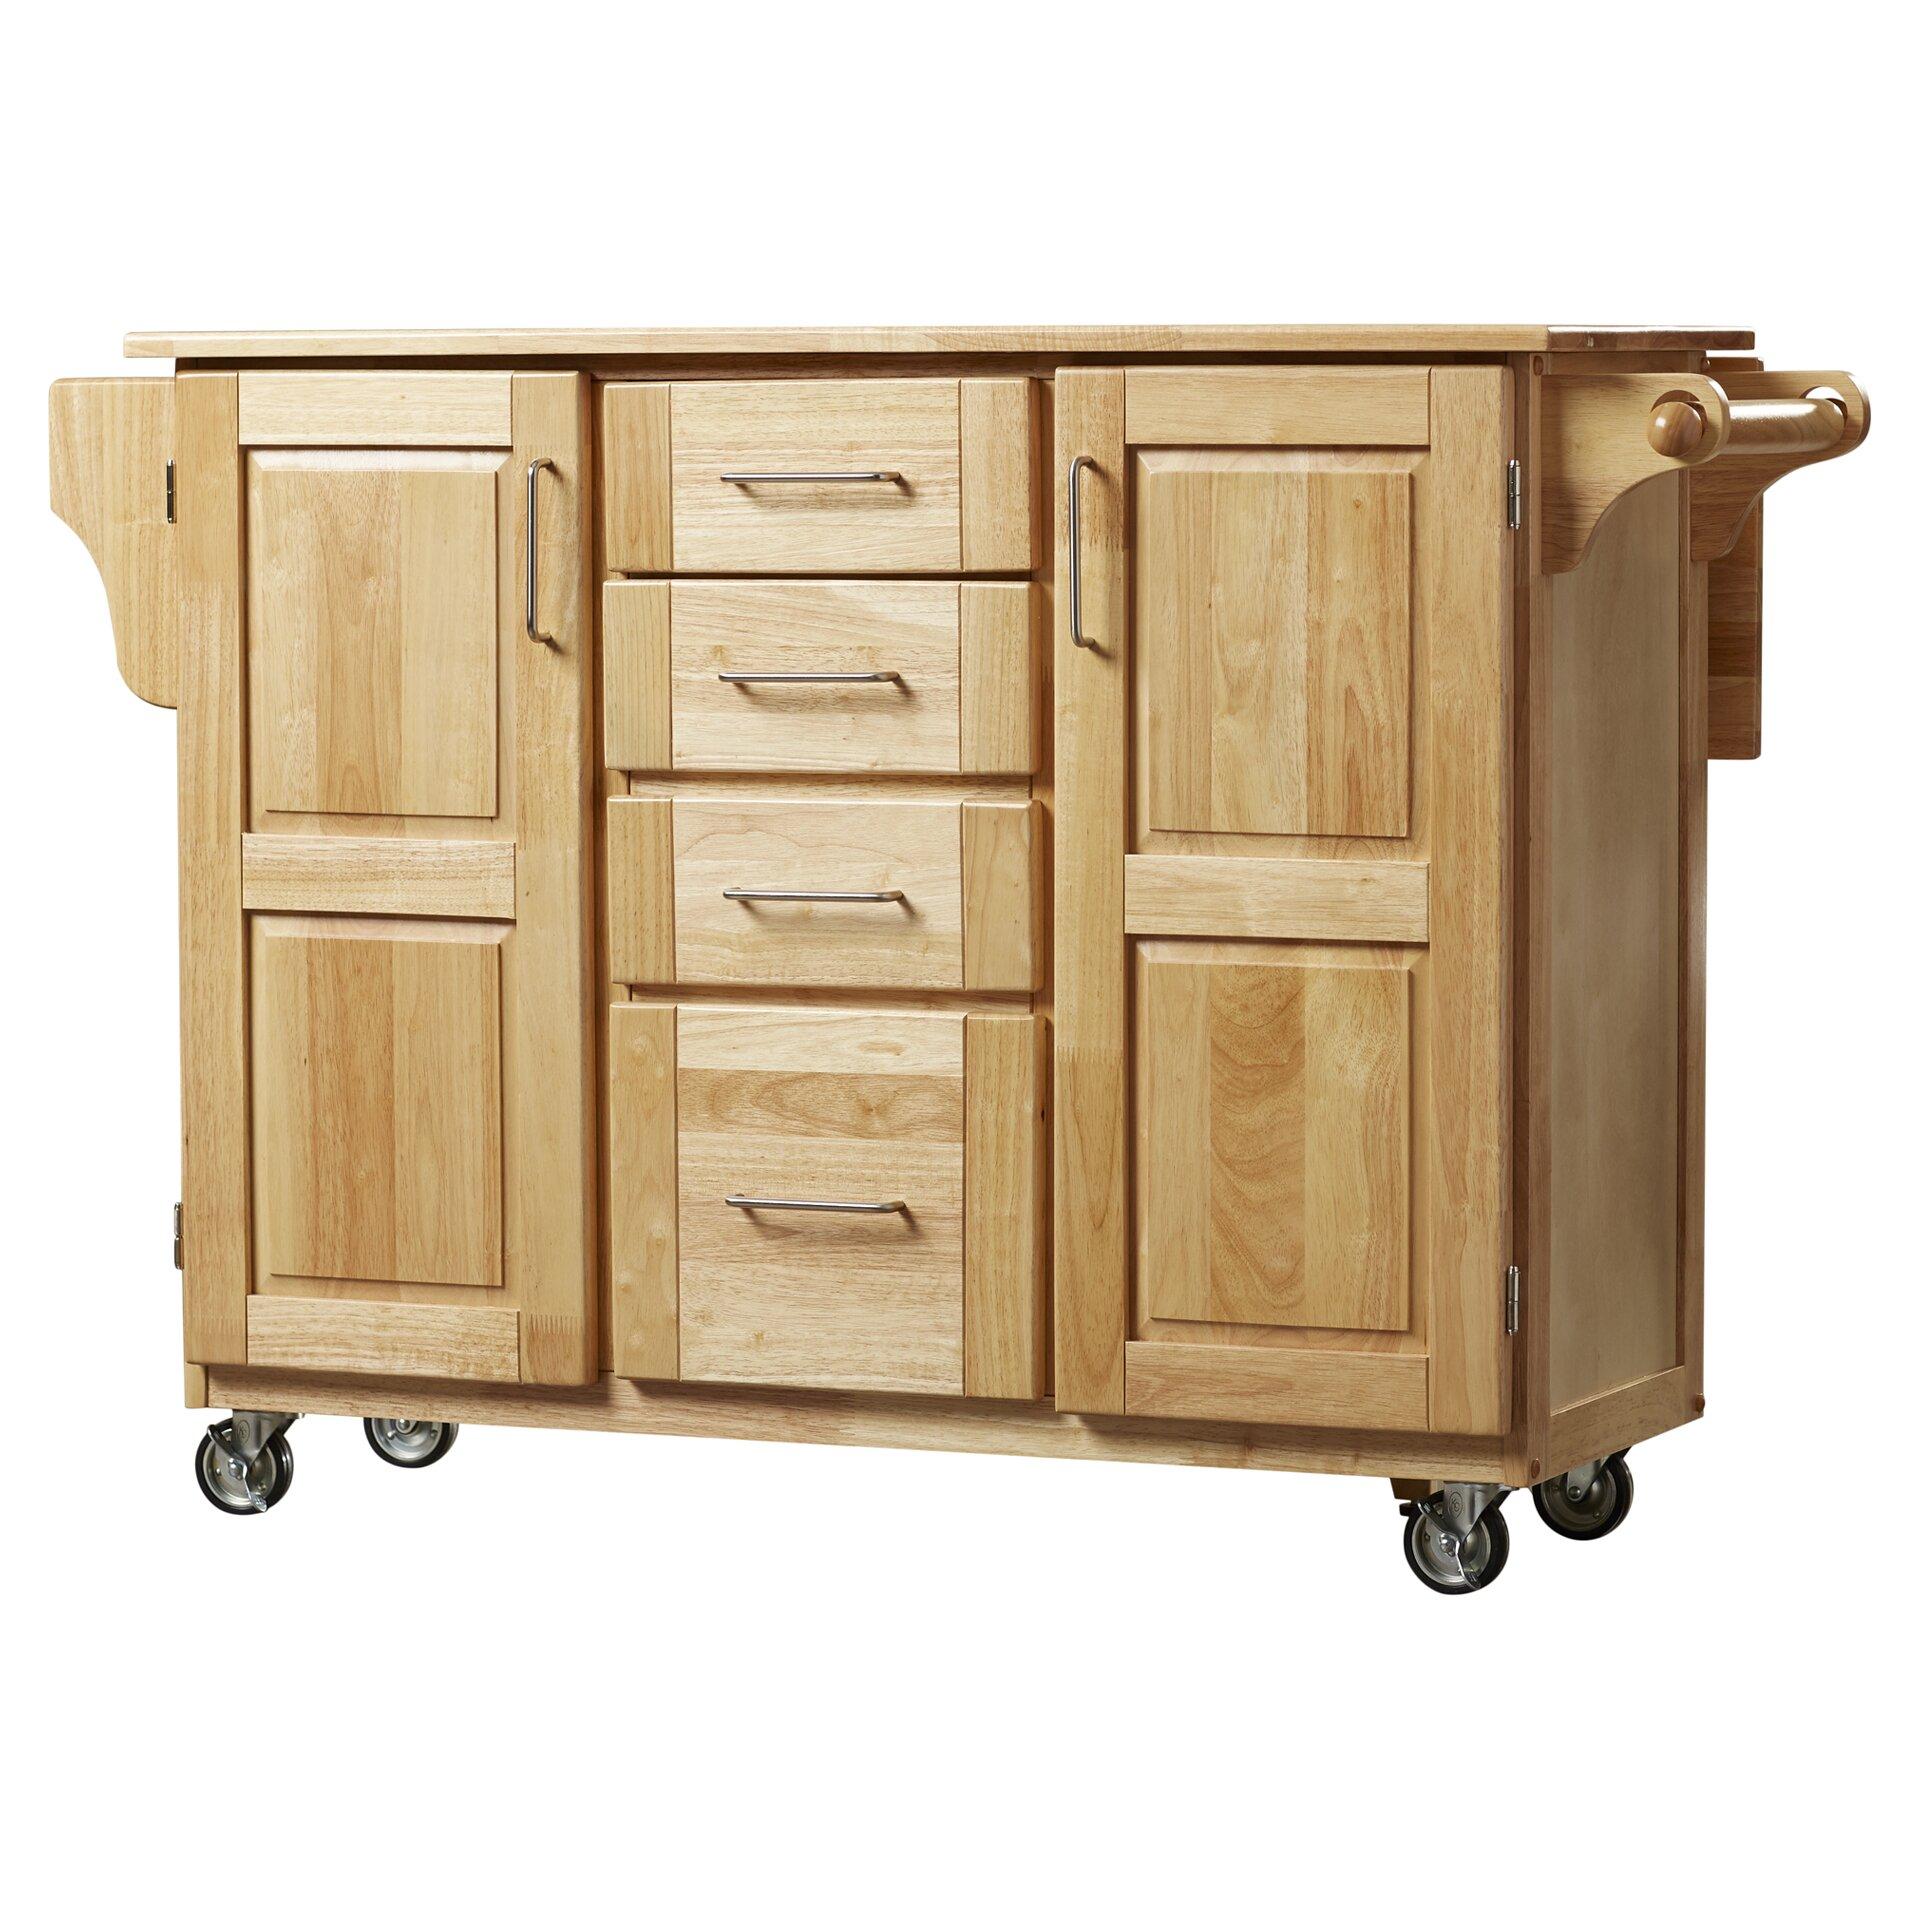 august grove killdeer kitchen island with wood top & reviews   wayfair